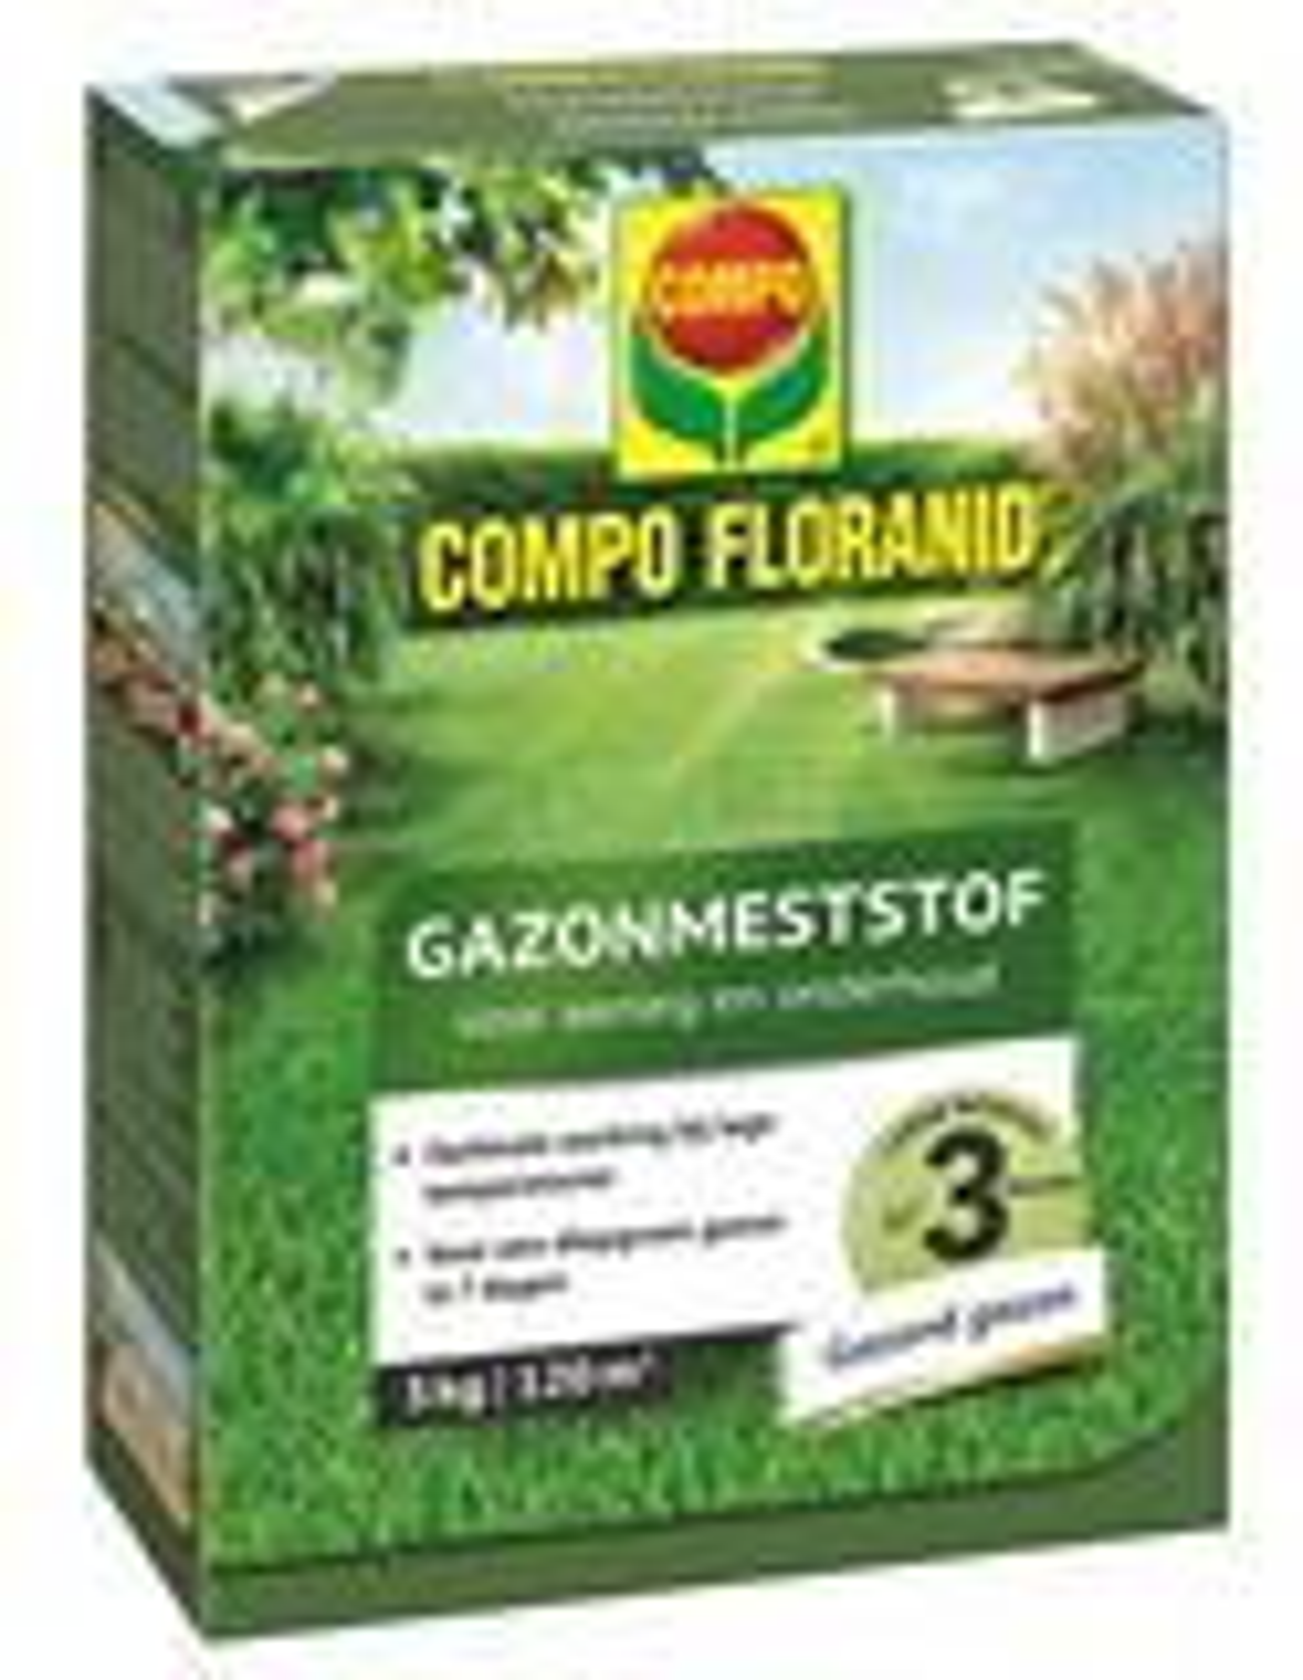 Compo floranid gazonmeststof voor aanleg & onderhoud - 120 m² - 3kg